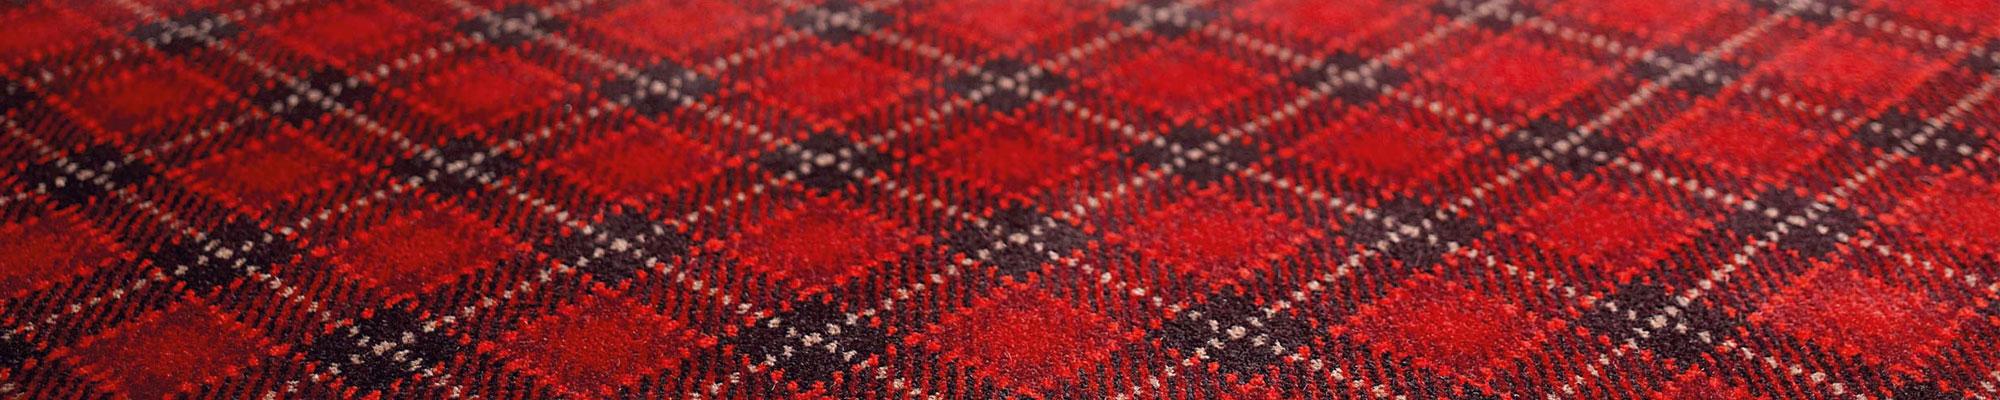 Carpet Shops Sunderland Tartan Carpets Adamms Carpets